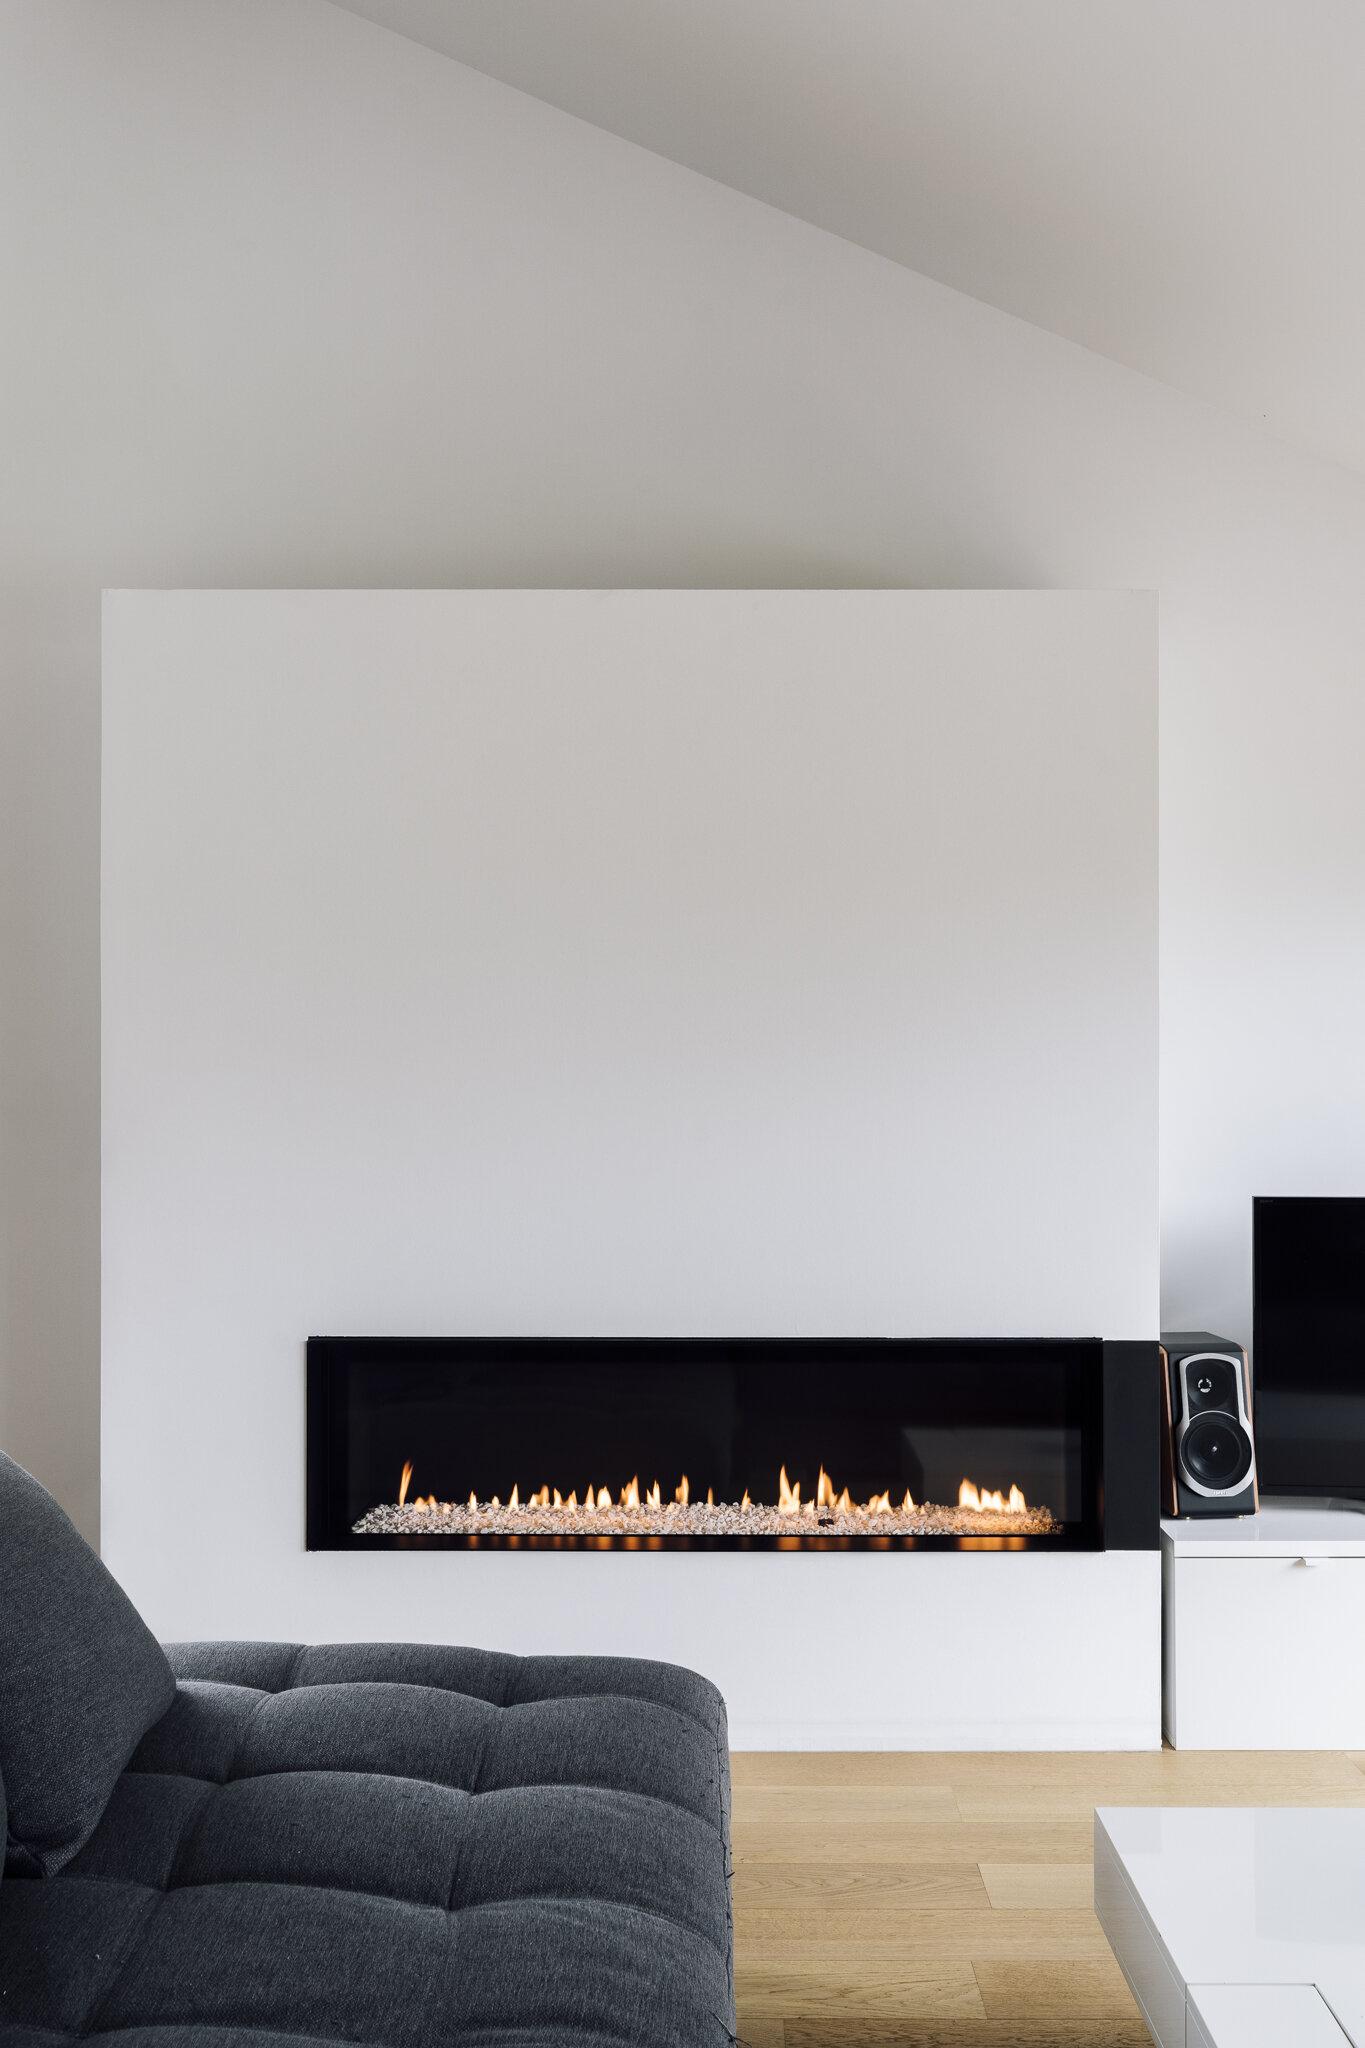 House by Quattro-Concept Architects in Achet, Belgium